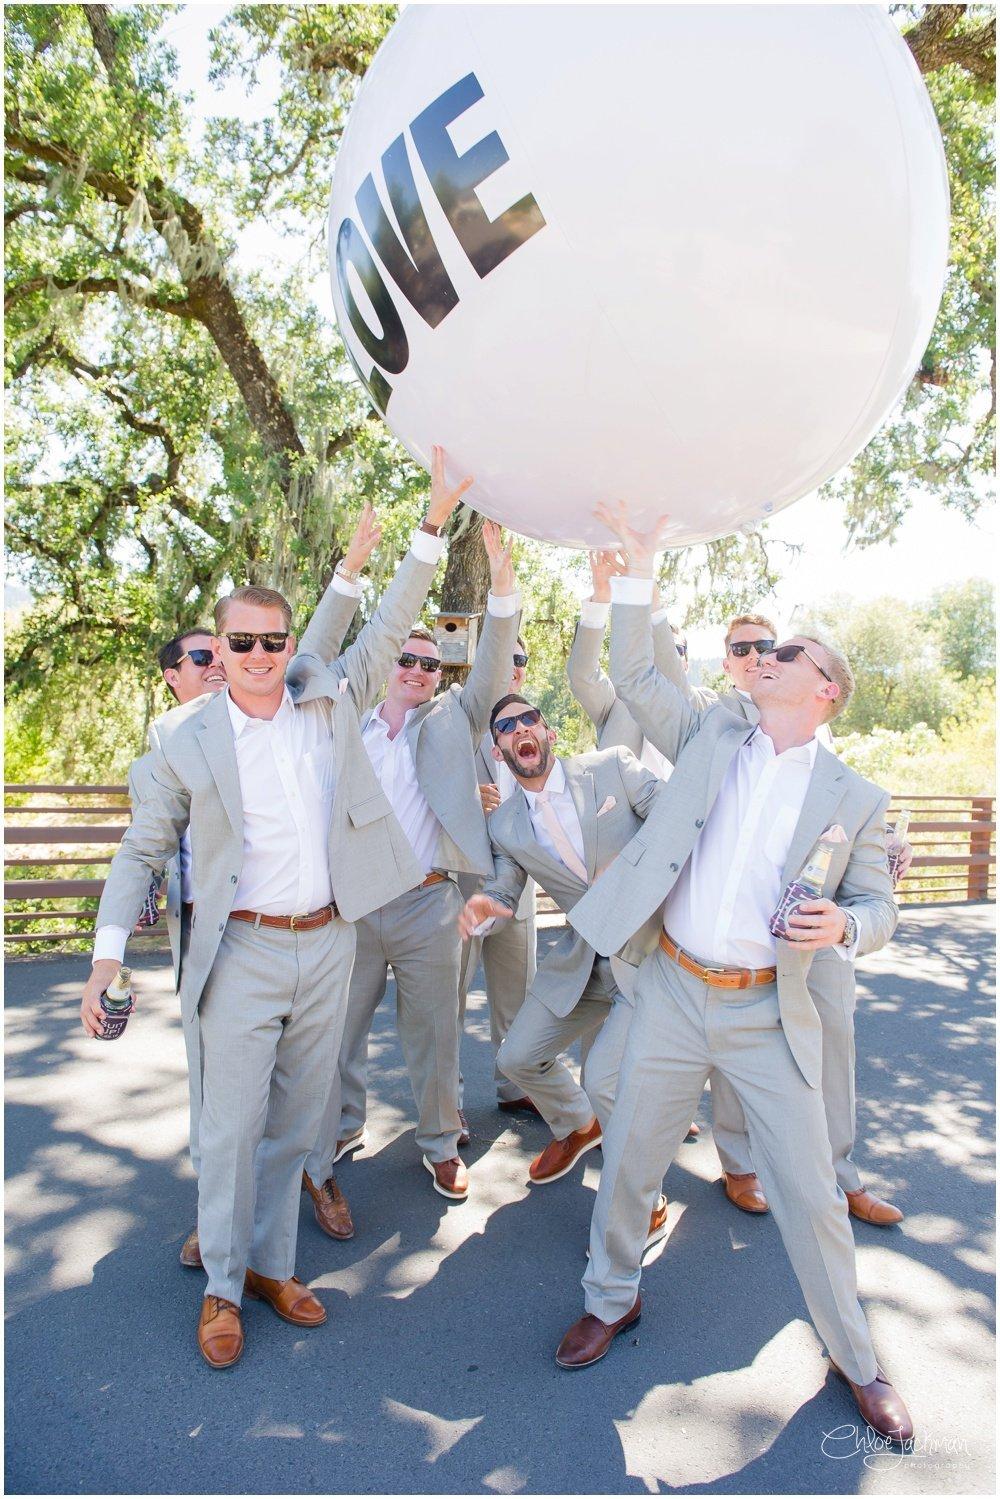 groom and groomsmen with giant balloon